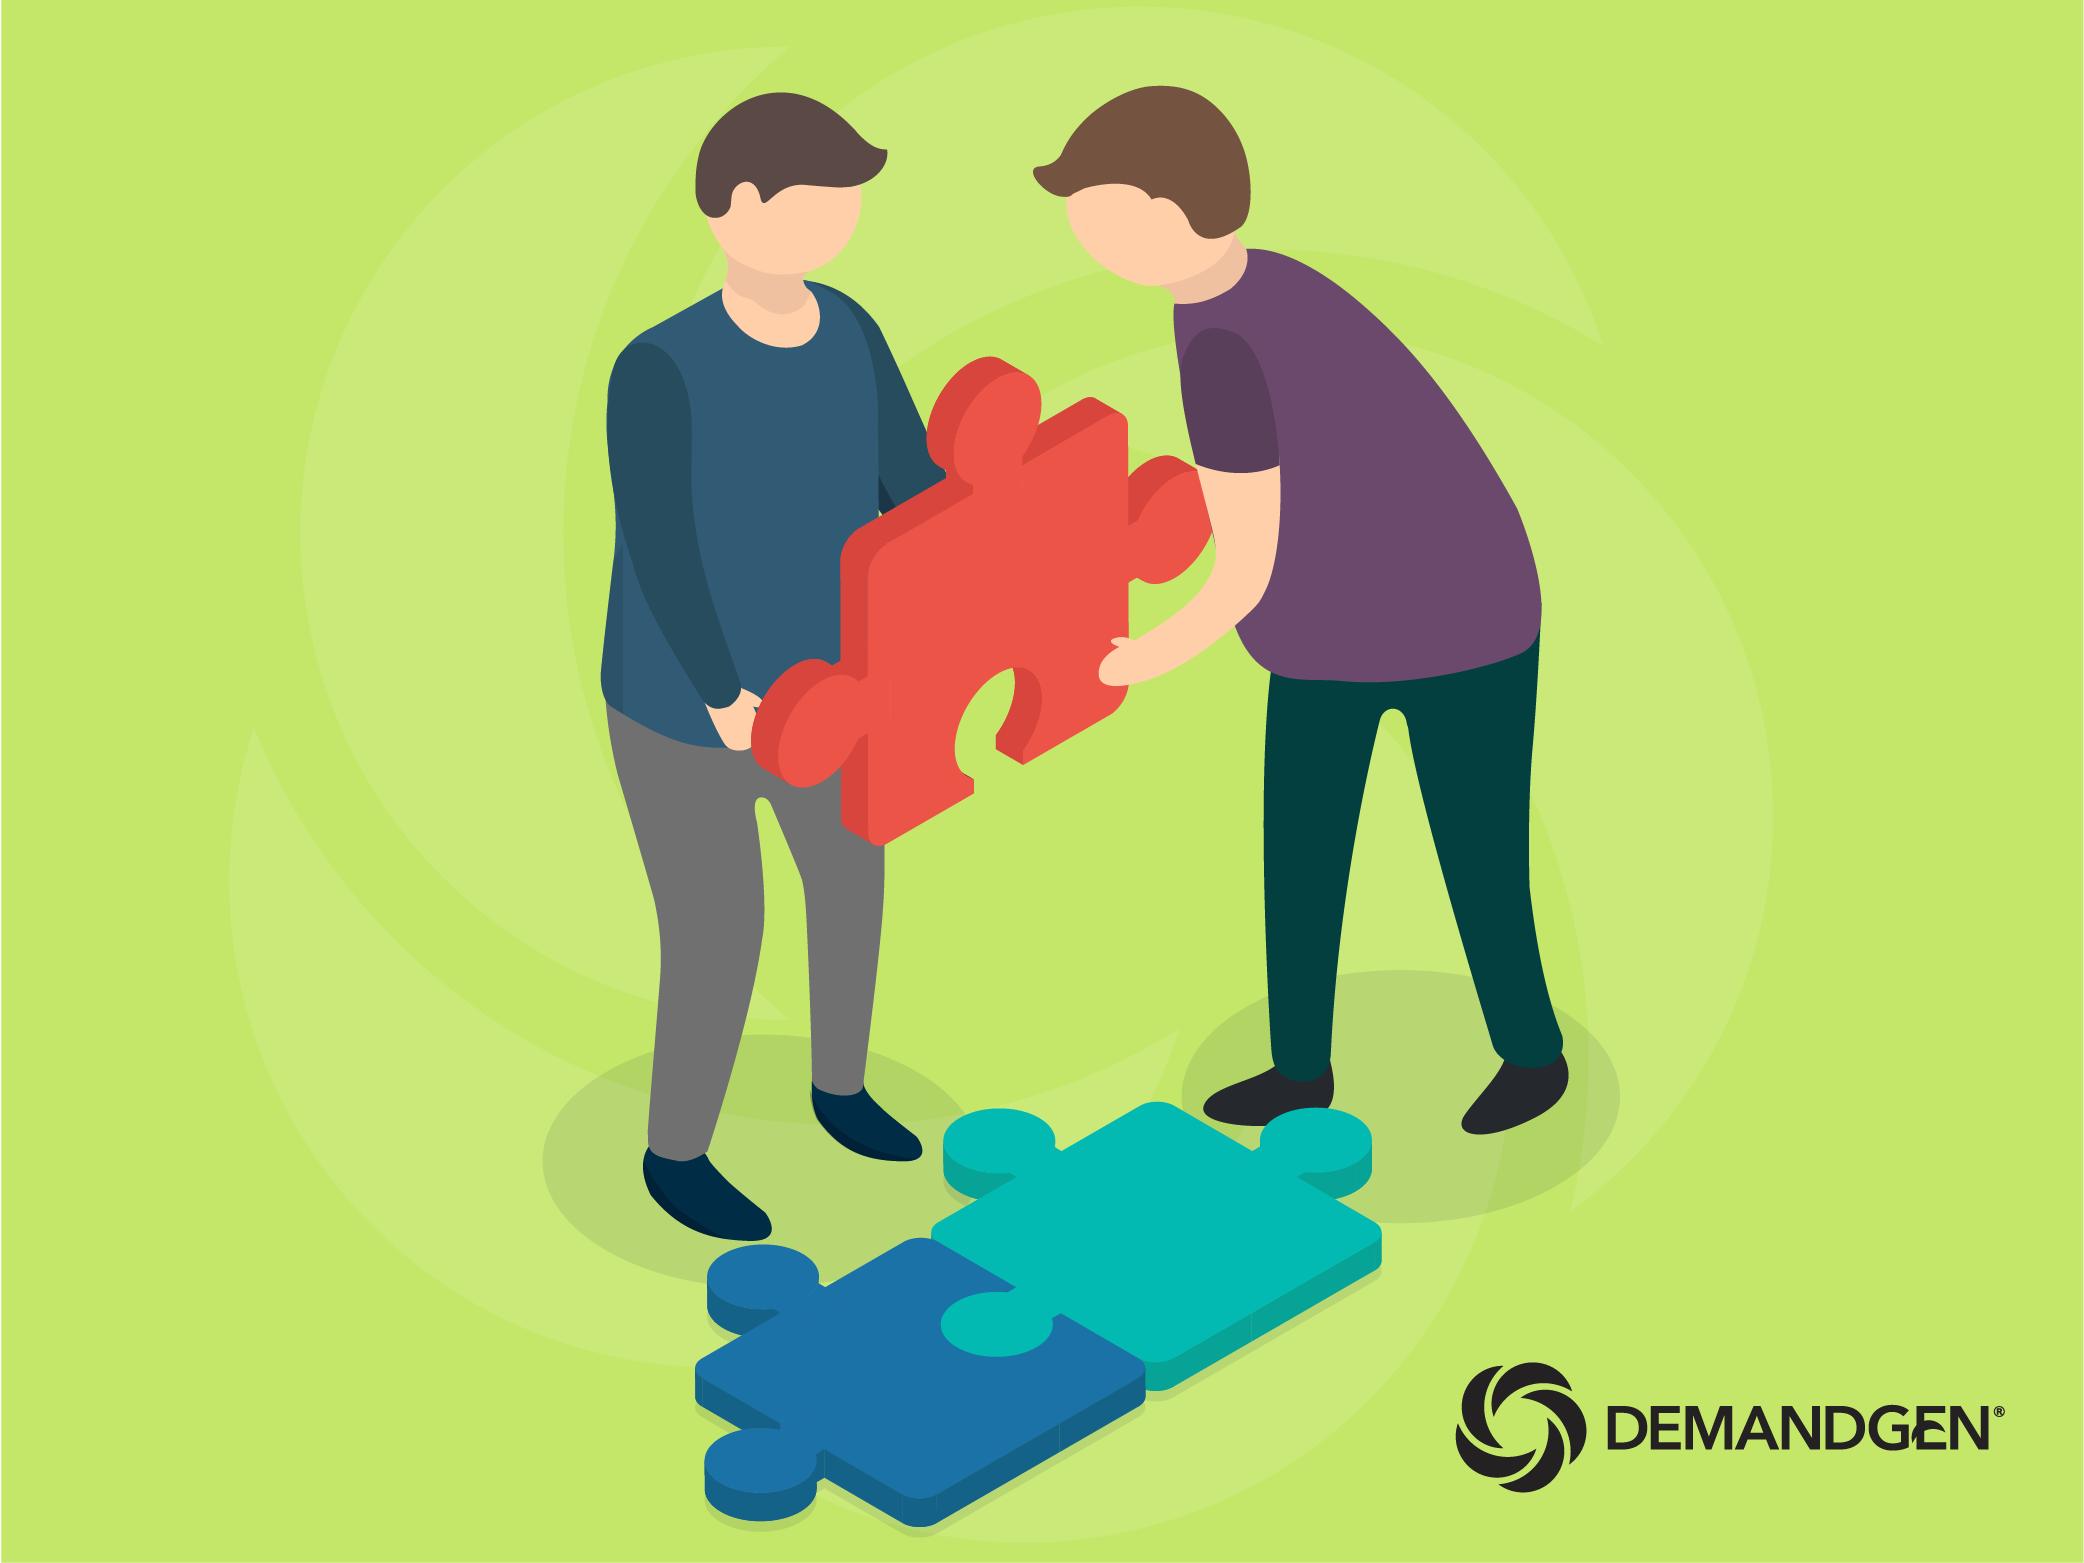 The Fundamentals of Alliances: 5 Steps for Building an Effective Partner Program